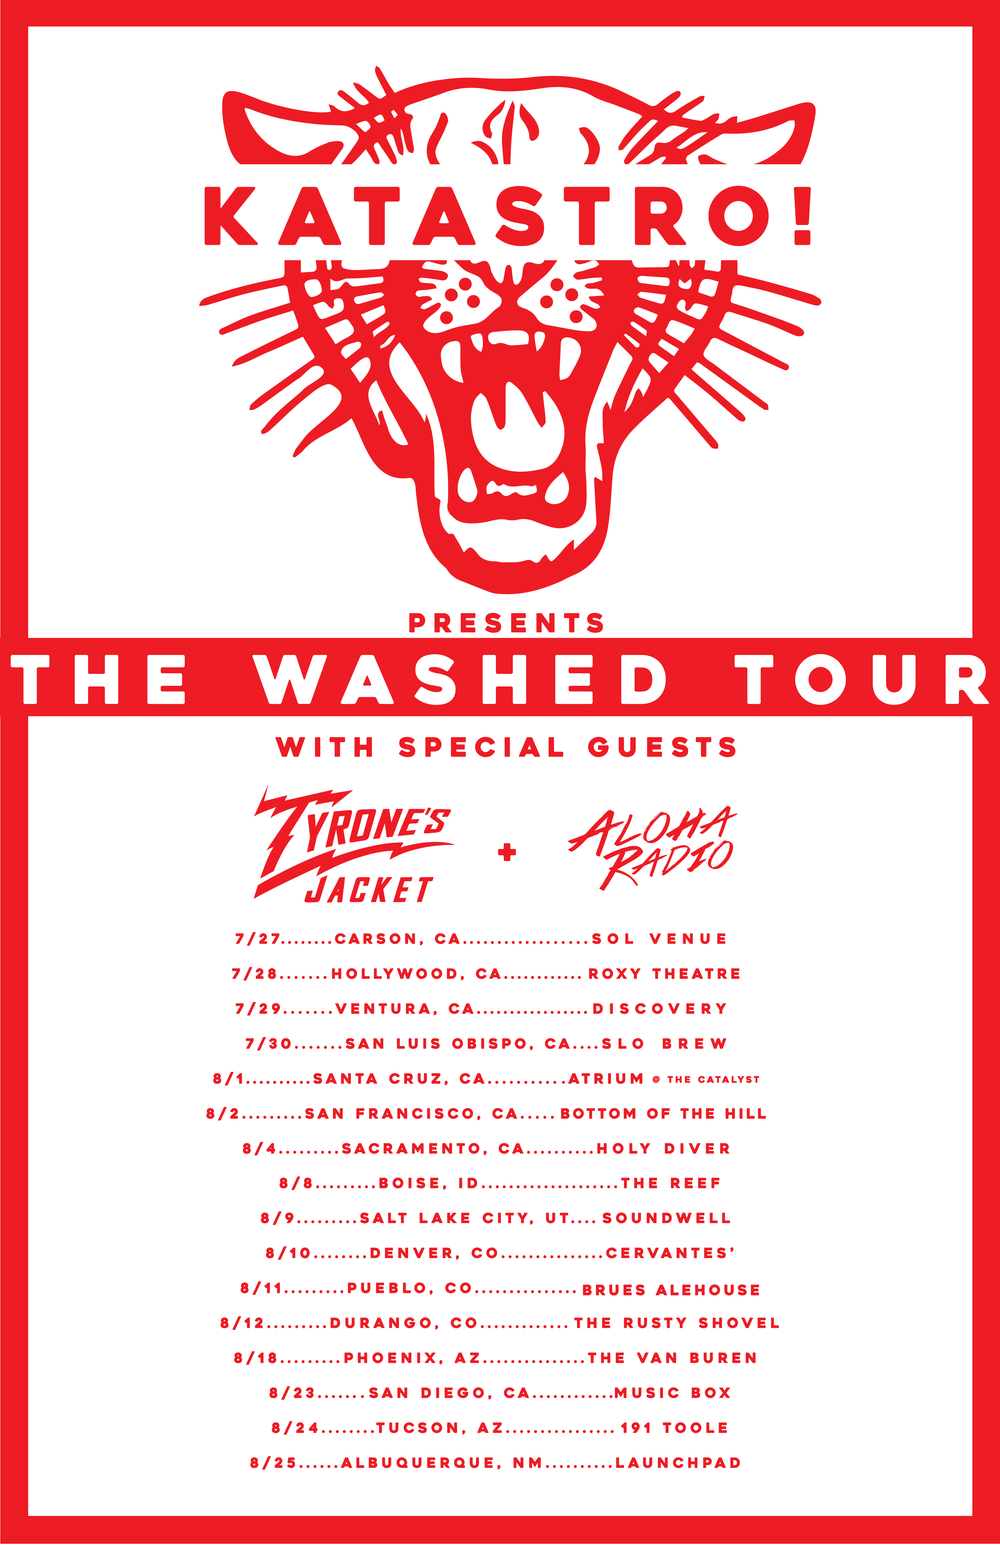 Katastro Tyrone's Jacket Aloha Radio The Washed Tour